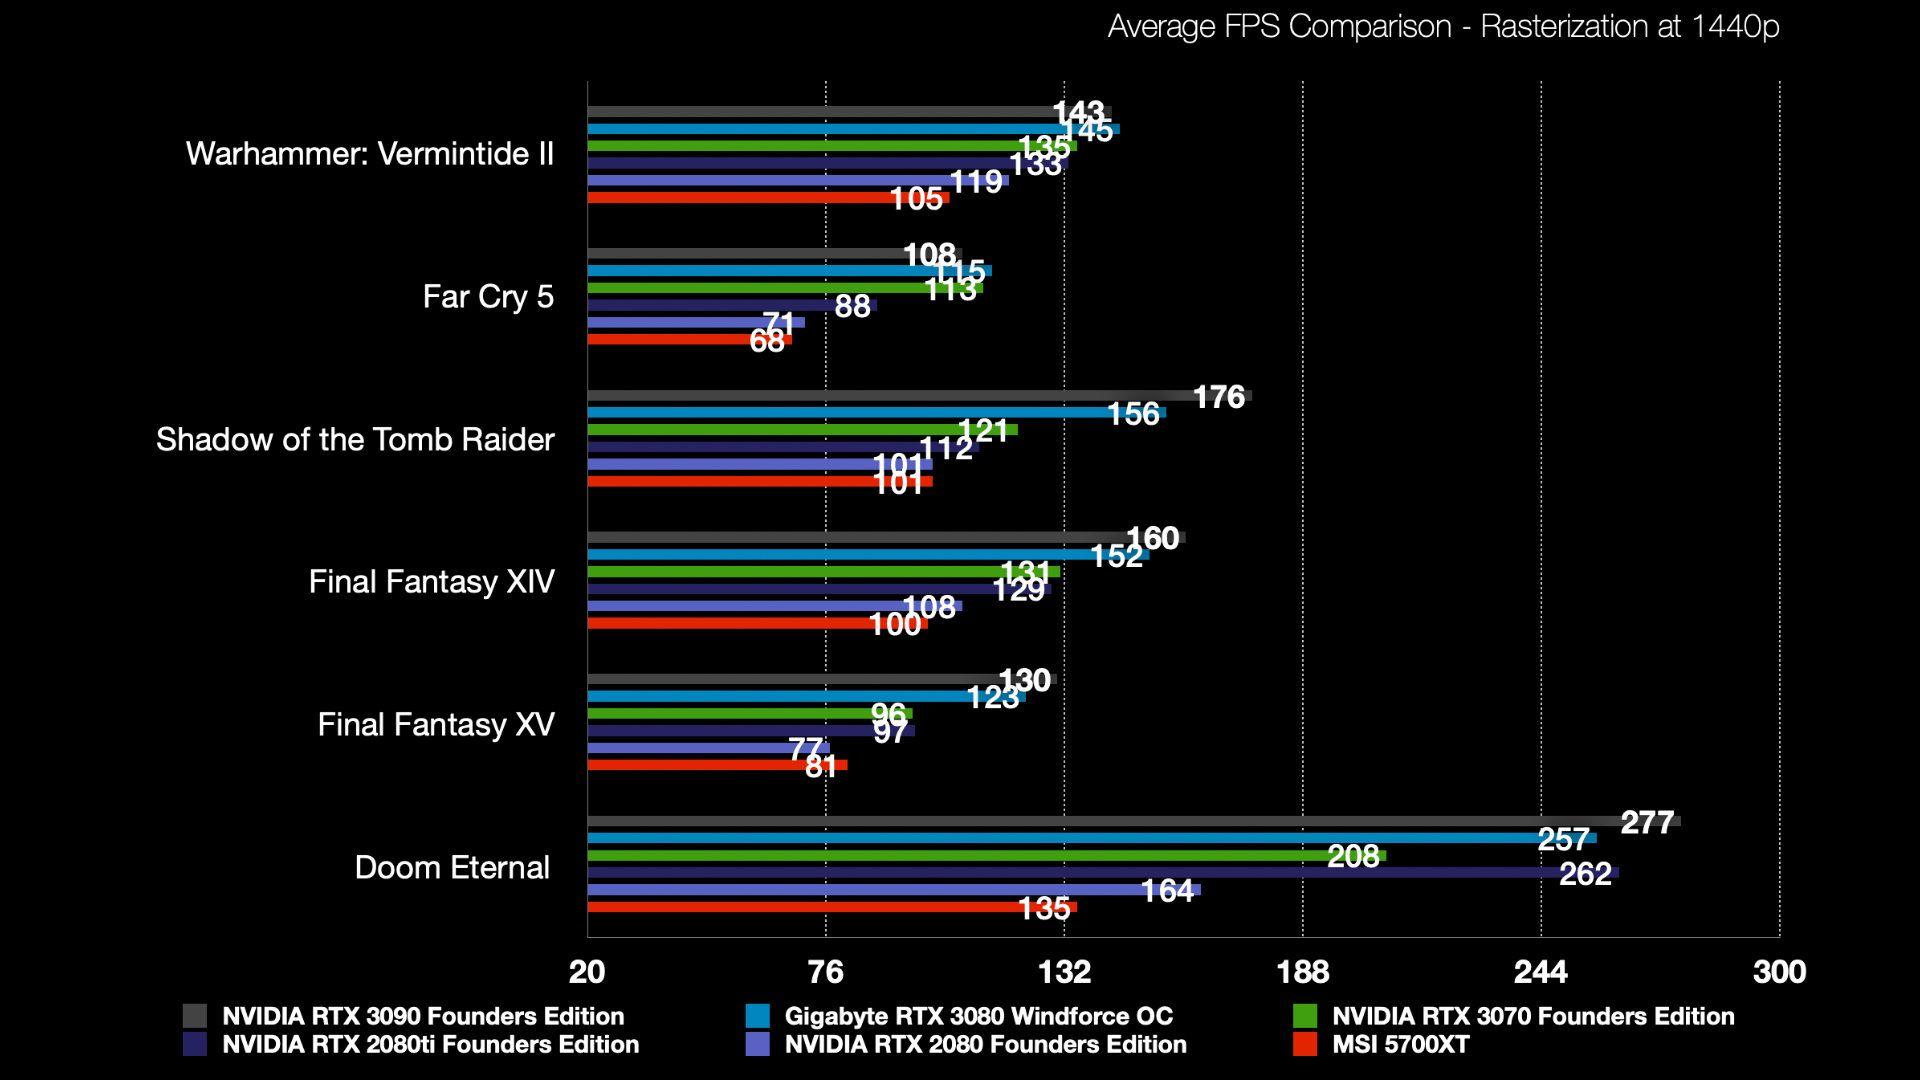 Rasterization 1440p